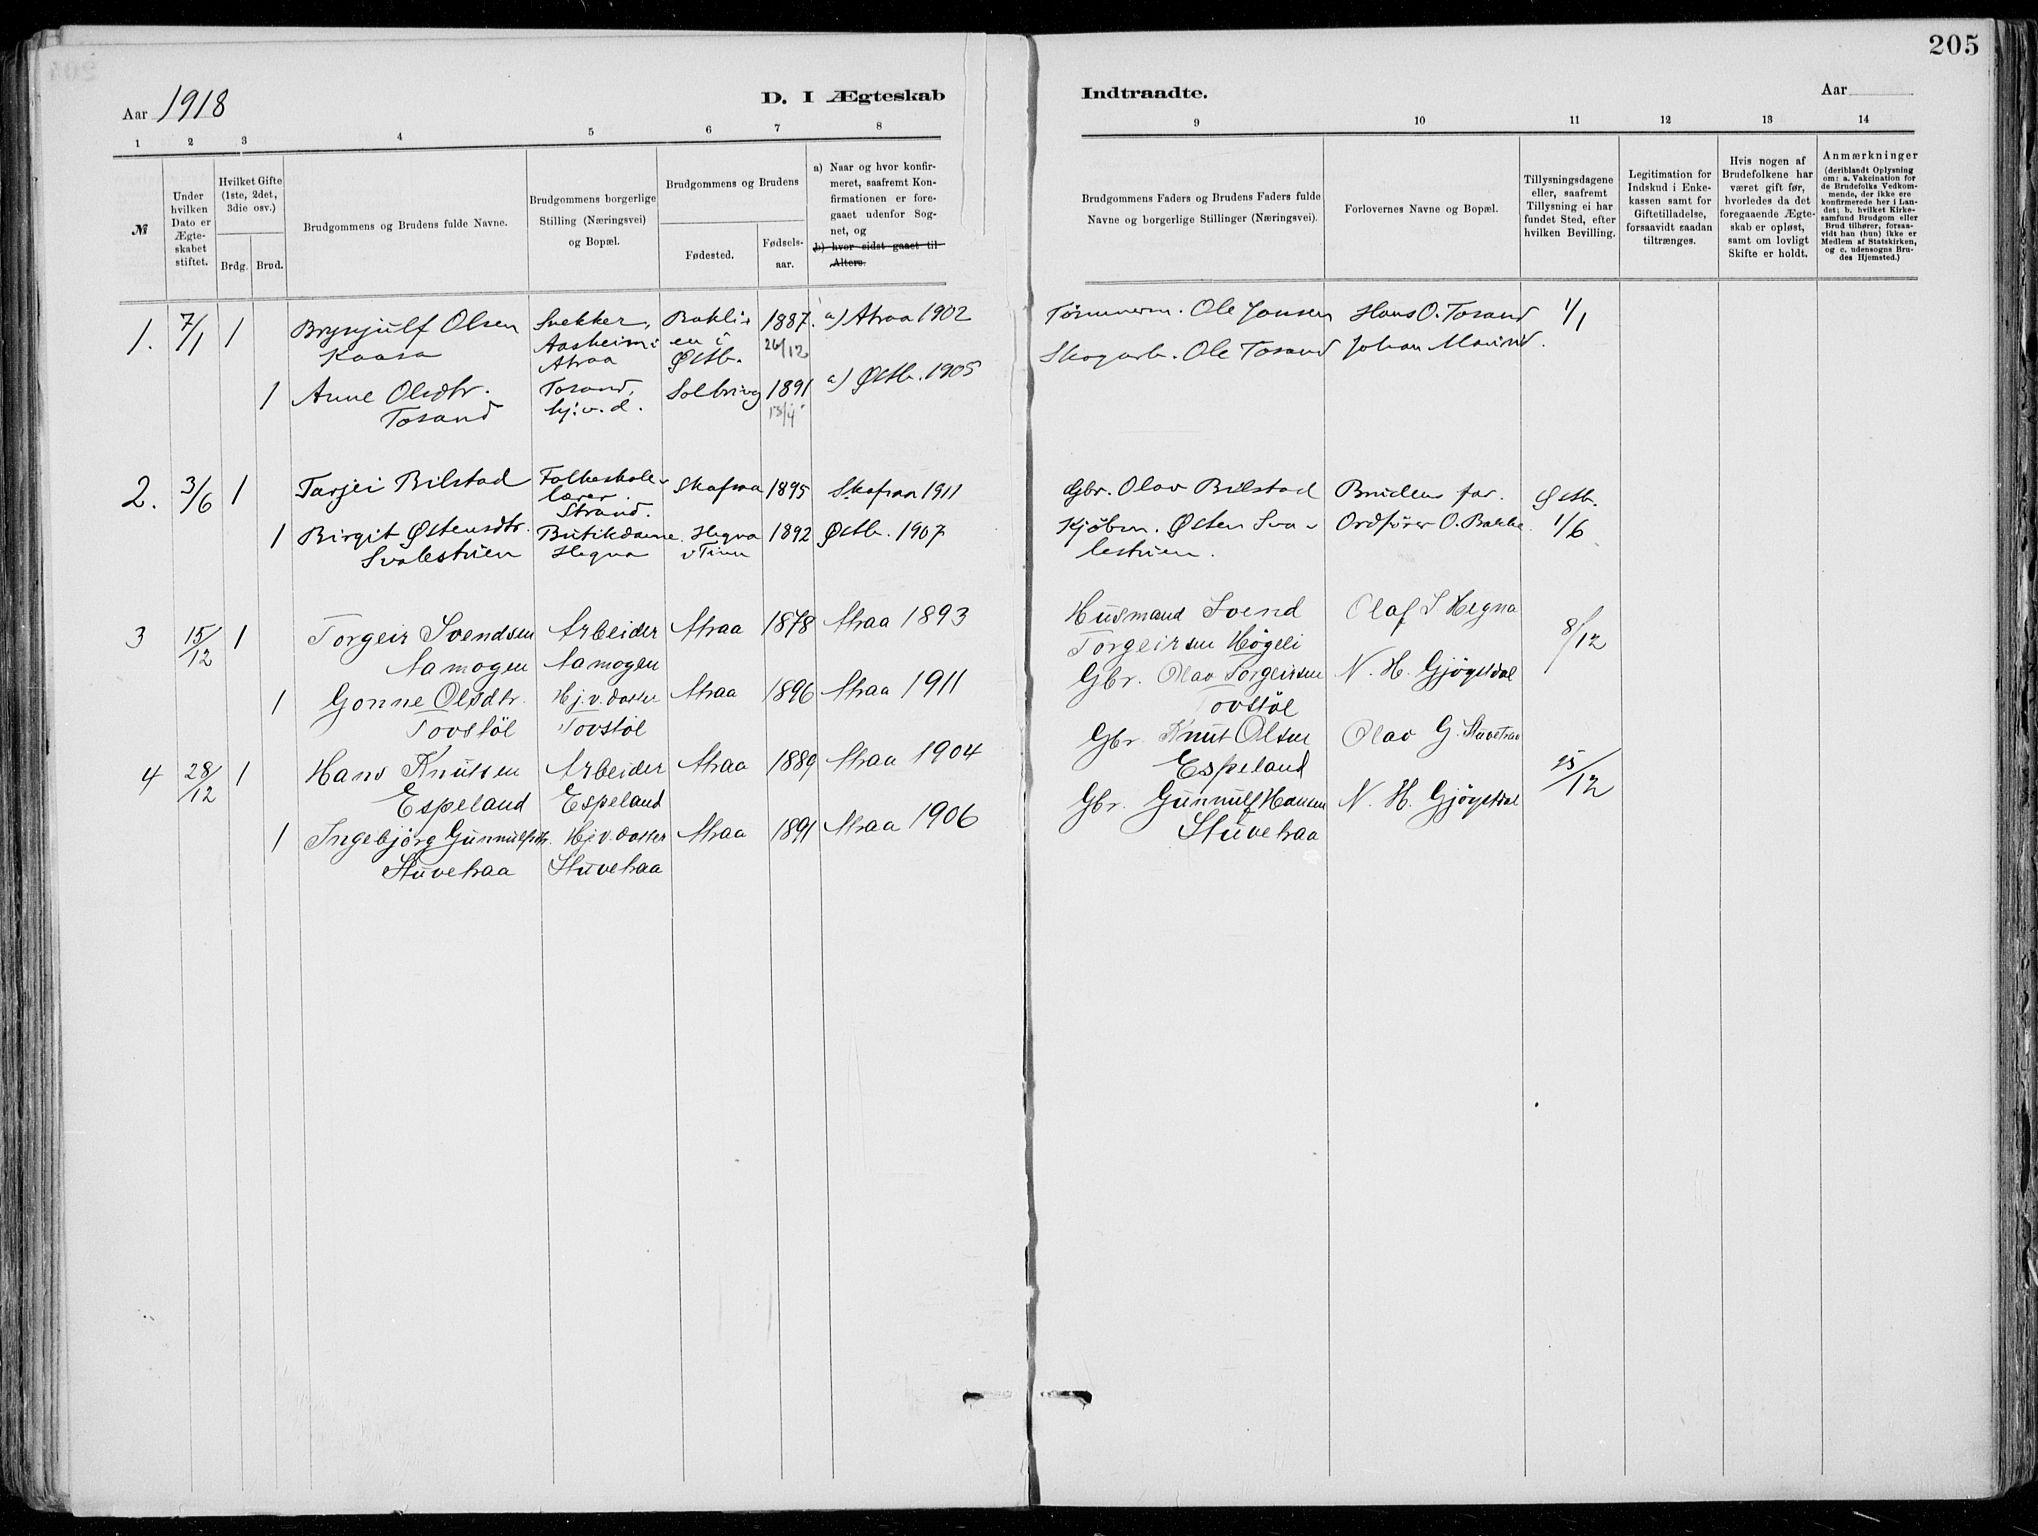 SAKO, Tinn kirkebøker, F/Fa/L0007: Ministerialbok nr. I 7, 1878-1922, s. 205